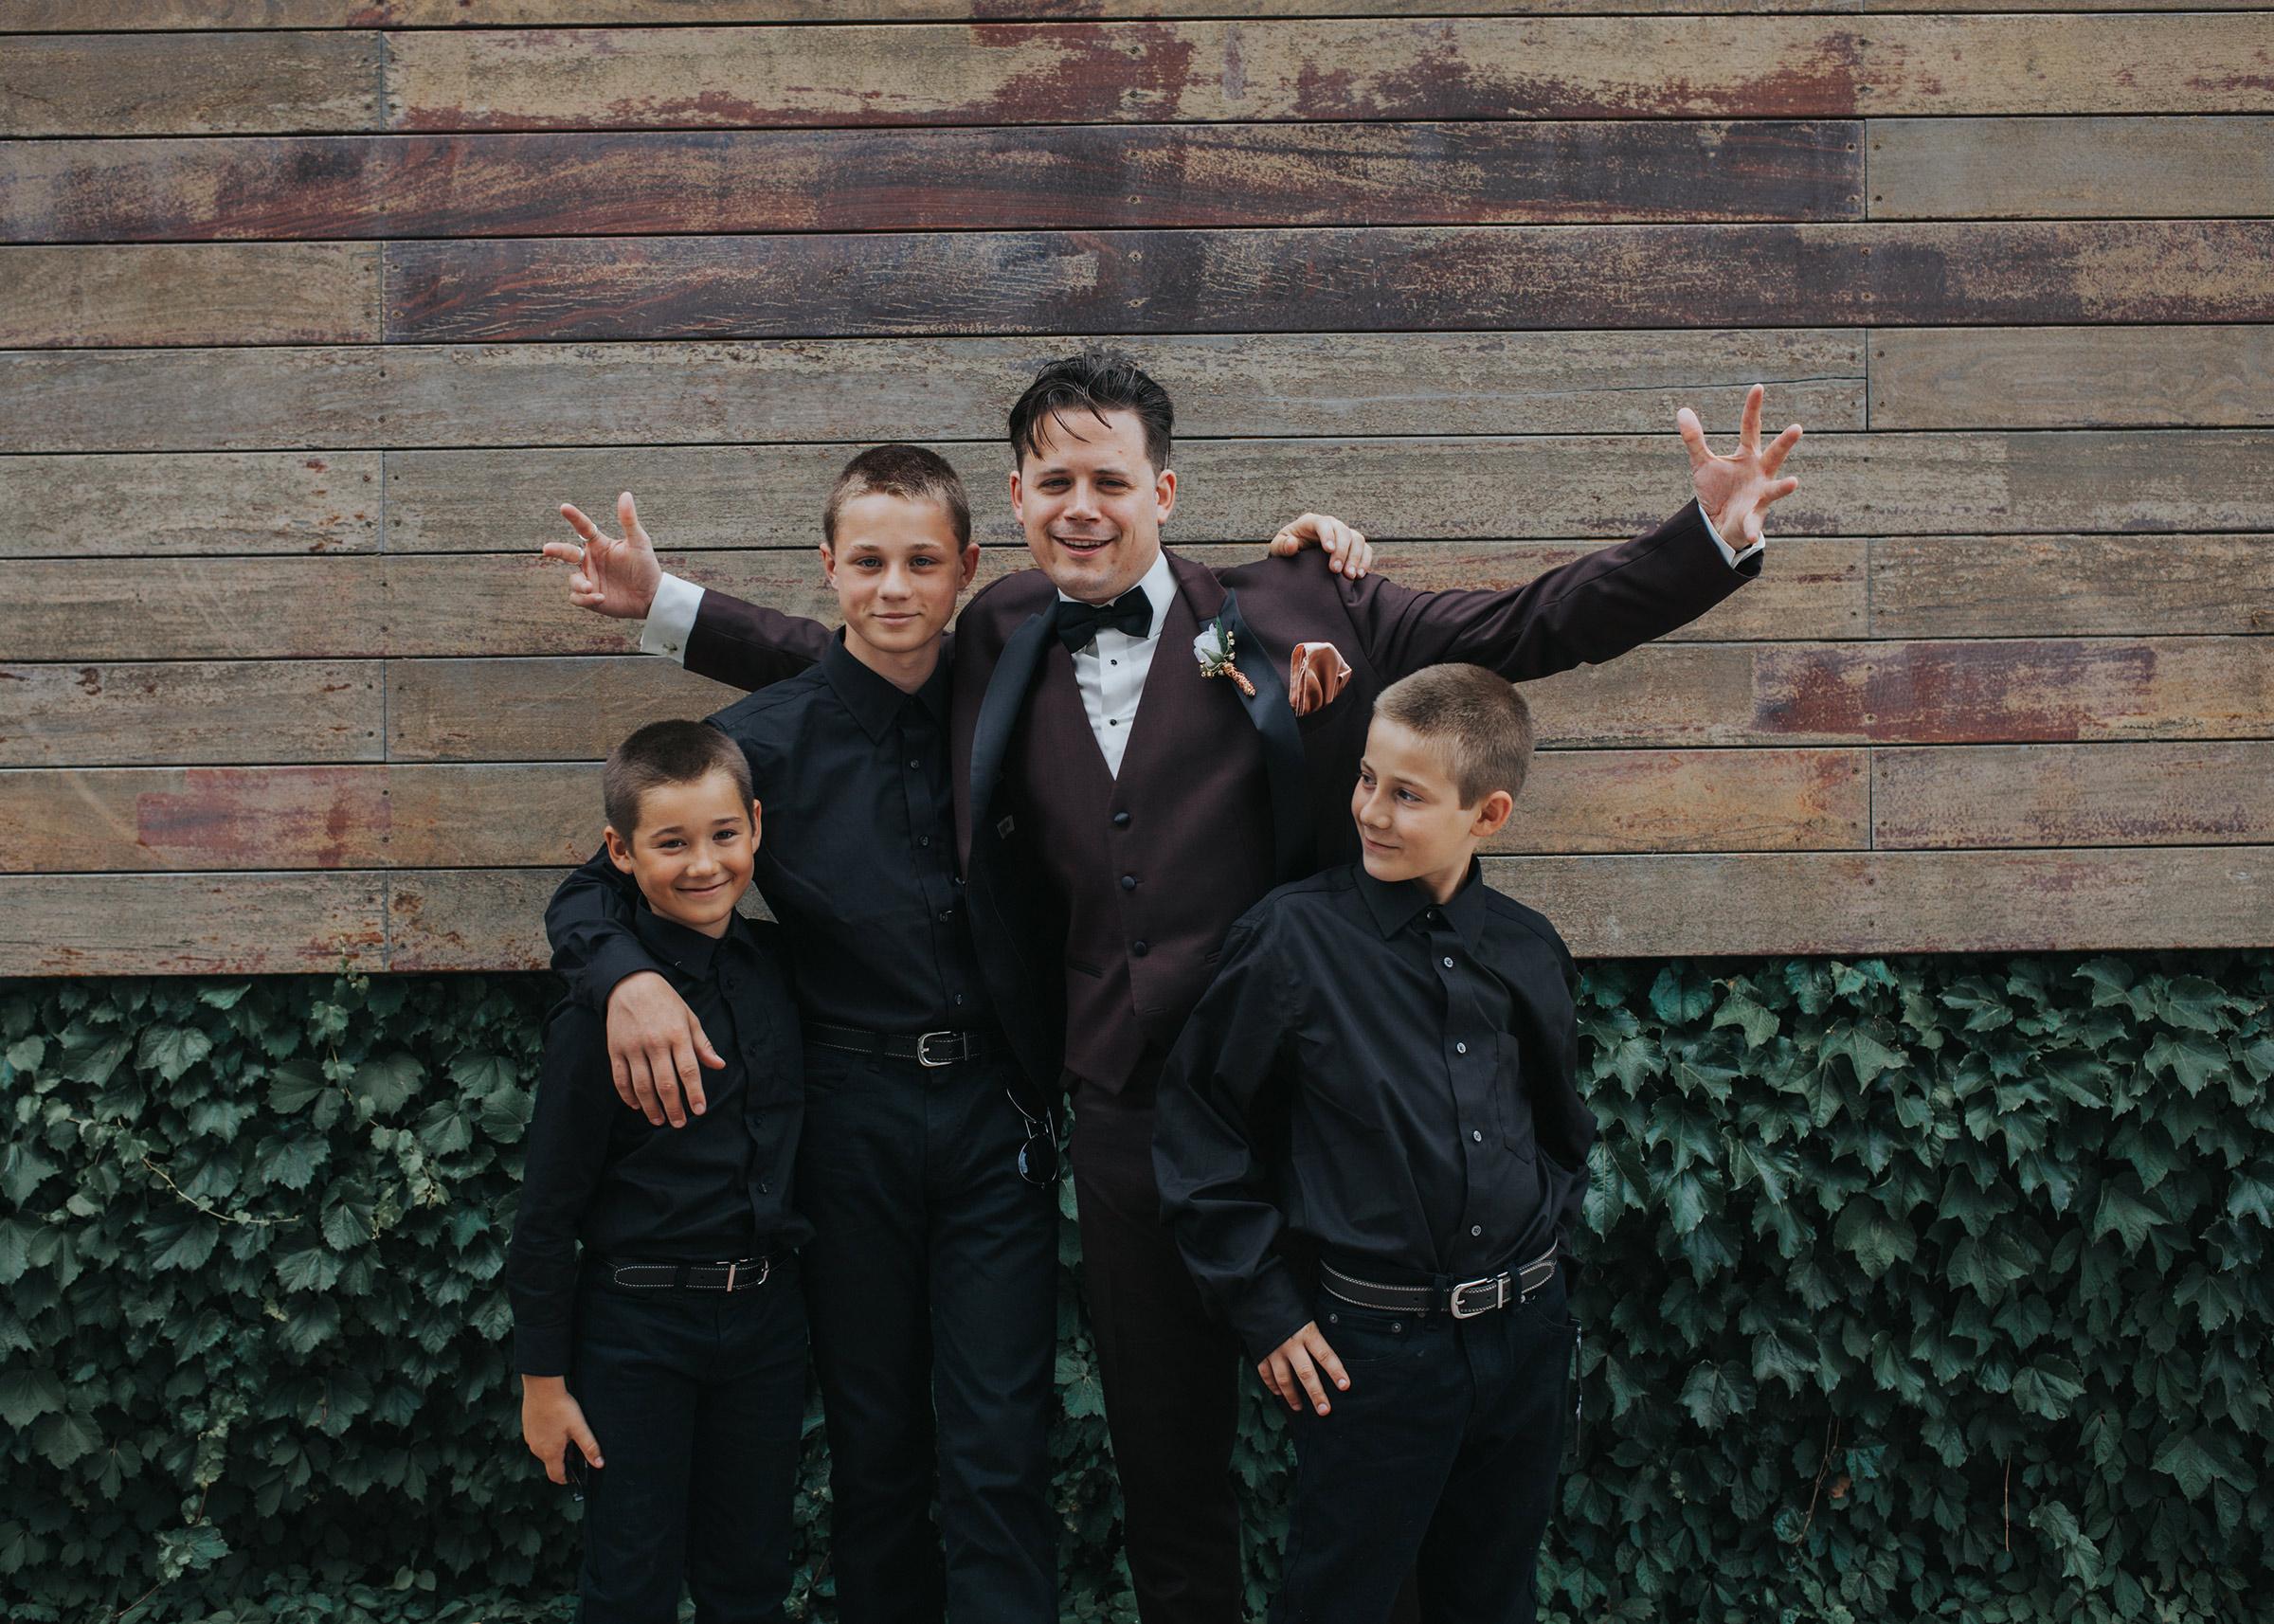 groom-with-kids-desmoines-iowa-ac-hotel-raelyn-ramey-photography.jpg